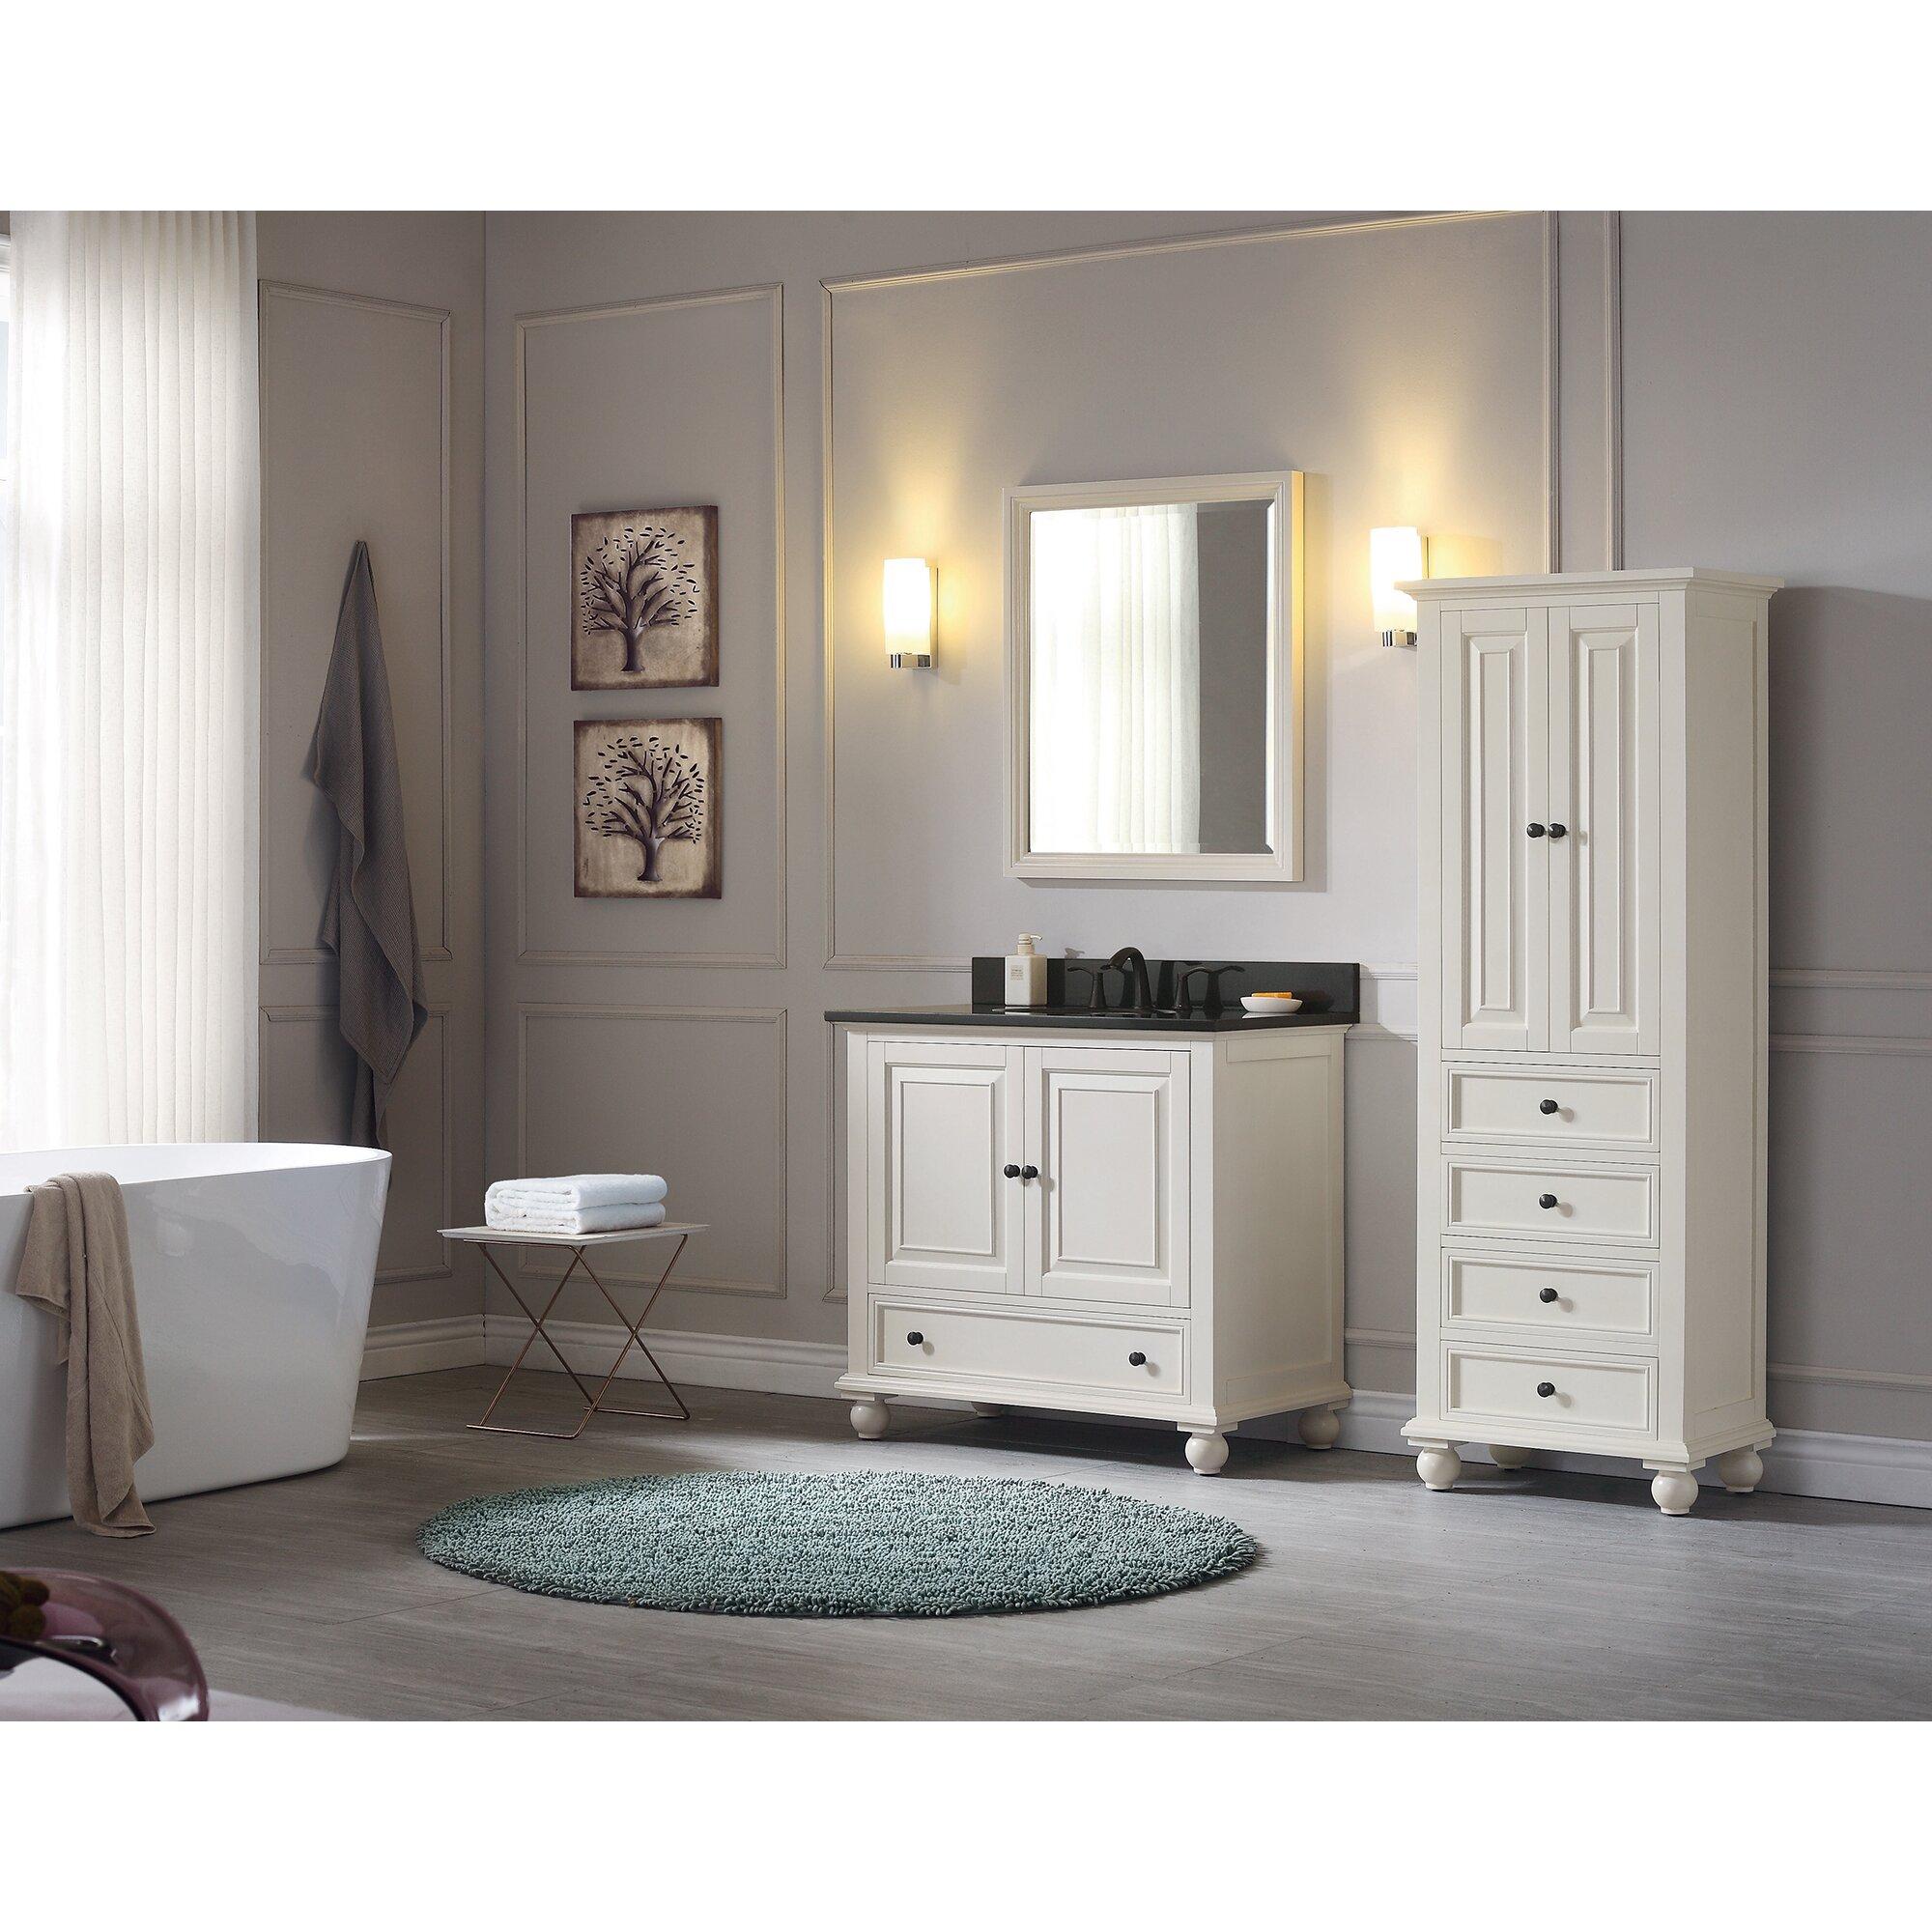 Bathroom Vanity Base Avanity Thompson 36 Single Bathroom Vanity Base Wayfair